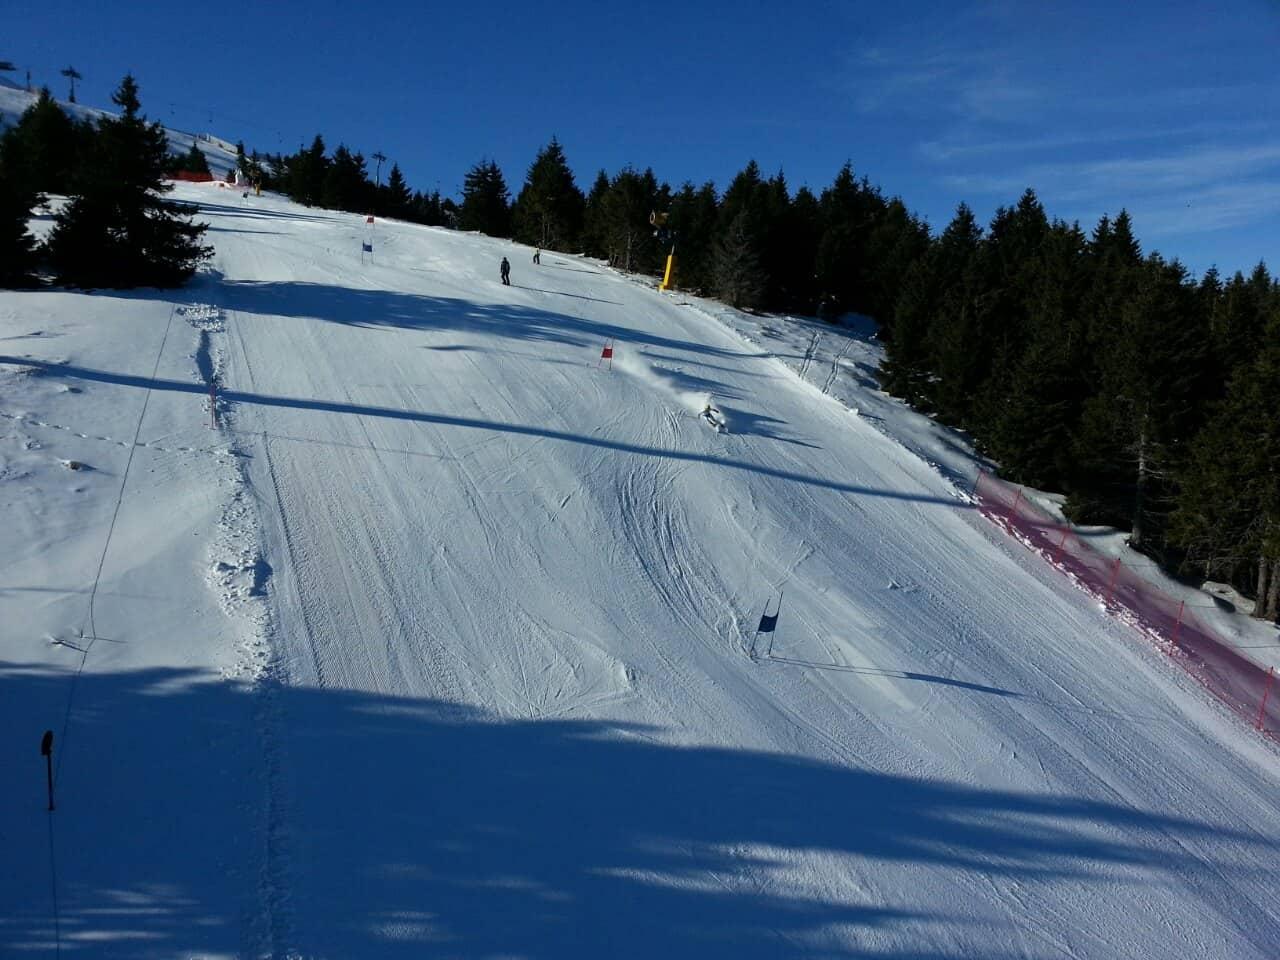 Kopaonik: Prvog dana SES kupa u ženskom slalomu Maša Janković osvojila je prvo mesto, dok Veronika Tomić nije uspela da završi trku.